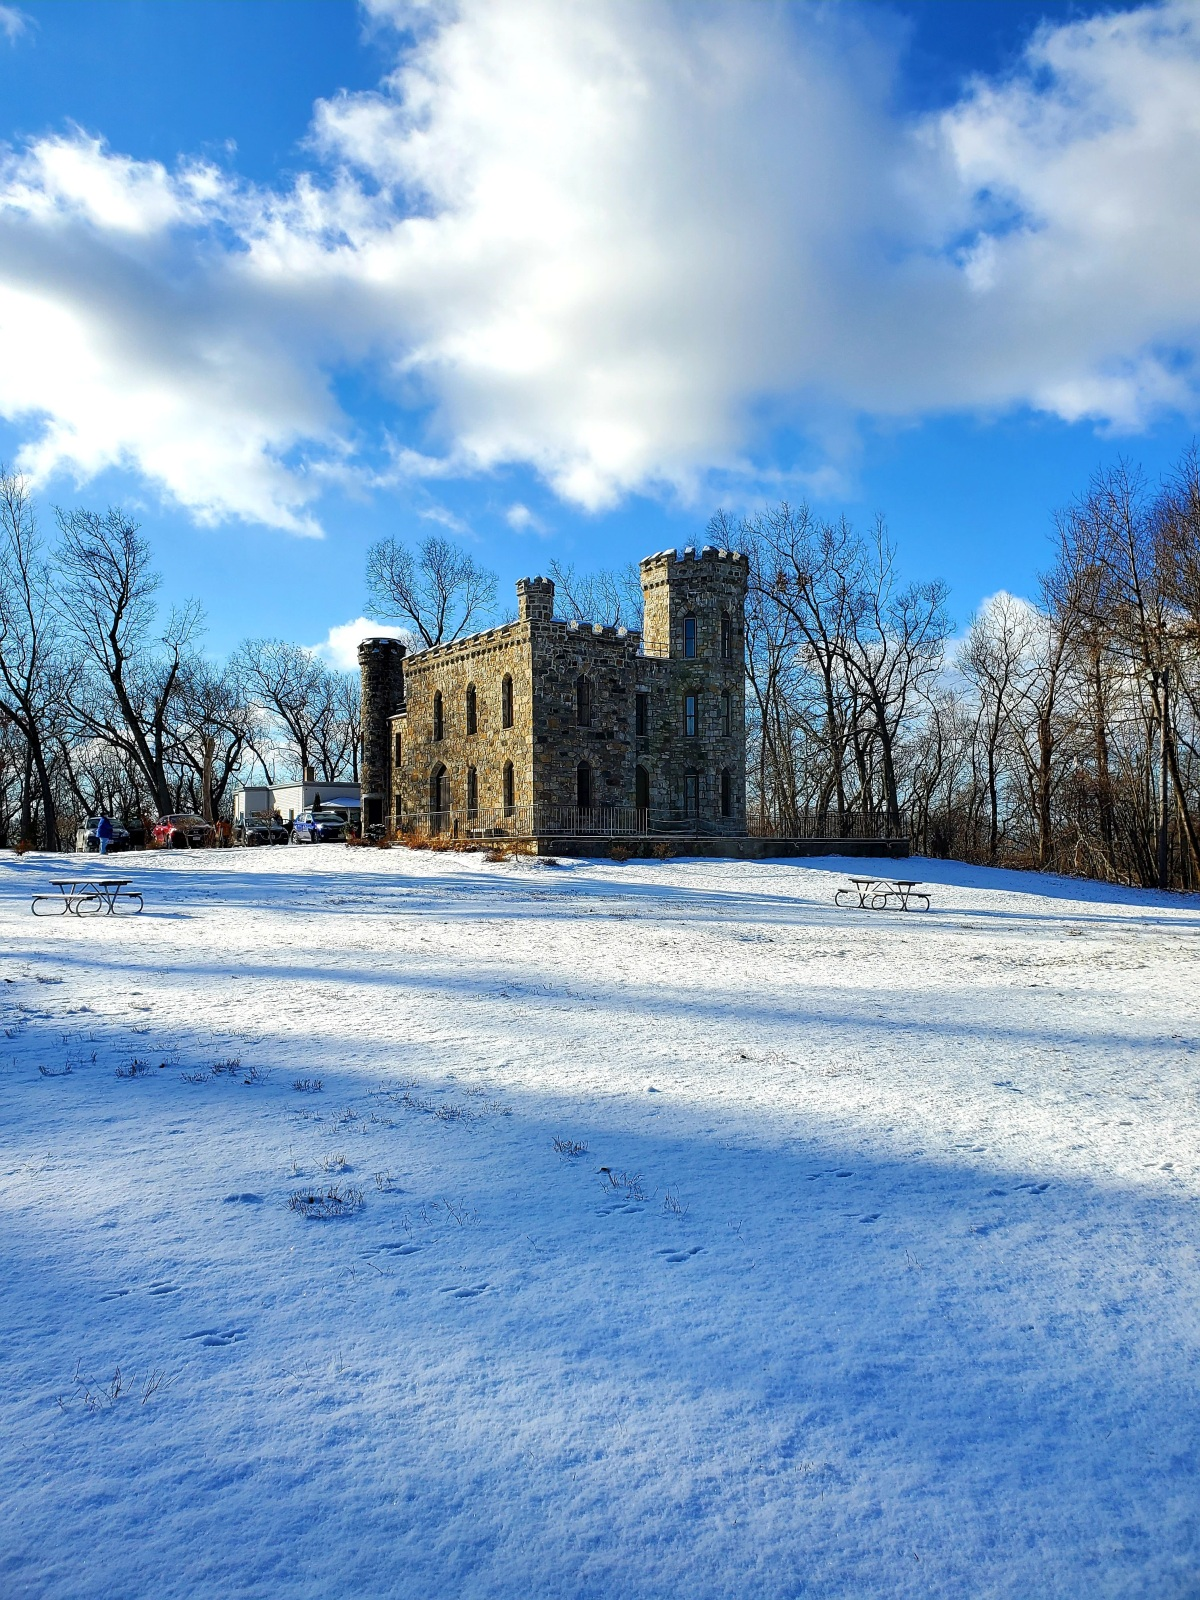 A view of Winnekenni Castle in the snow